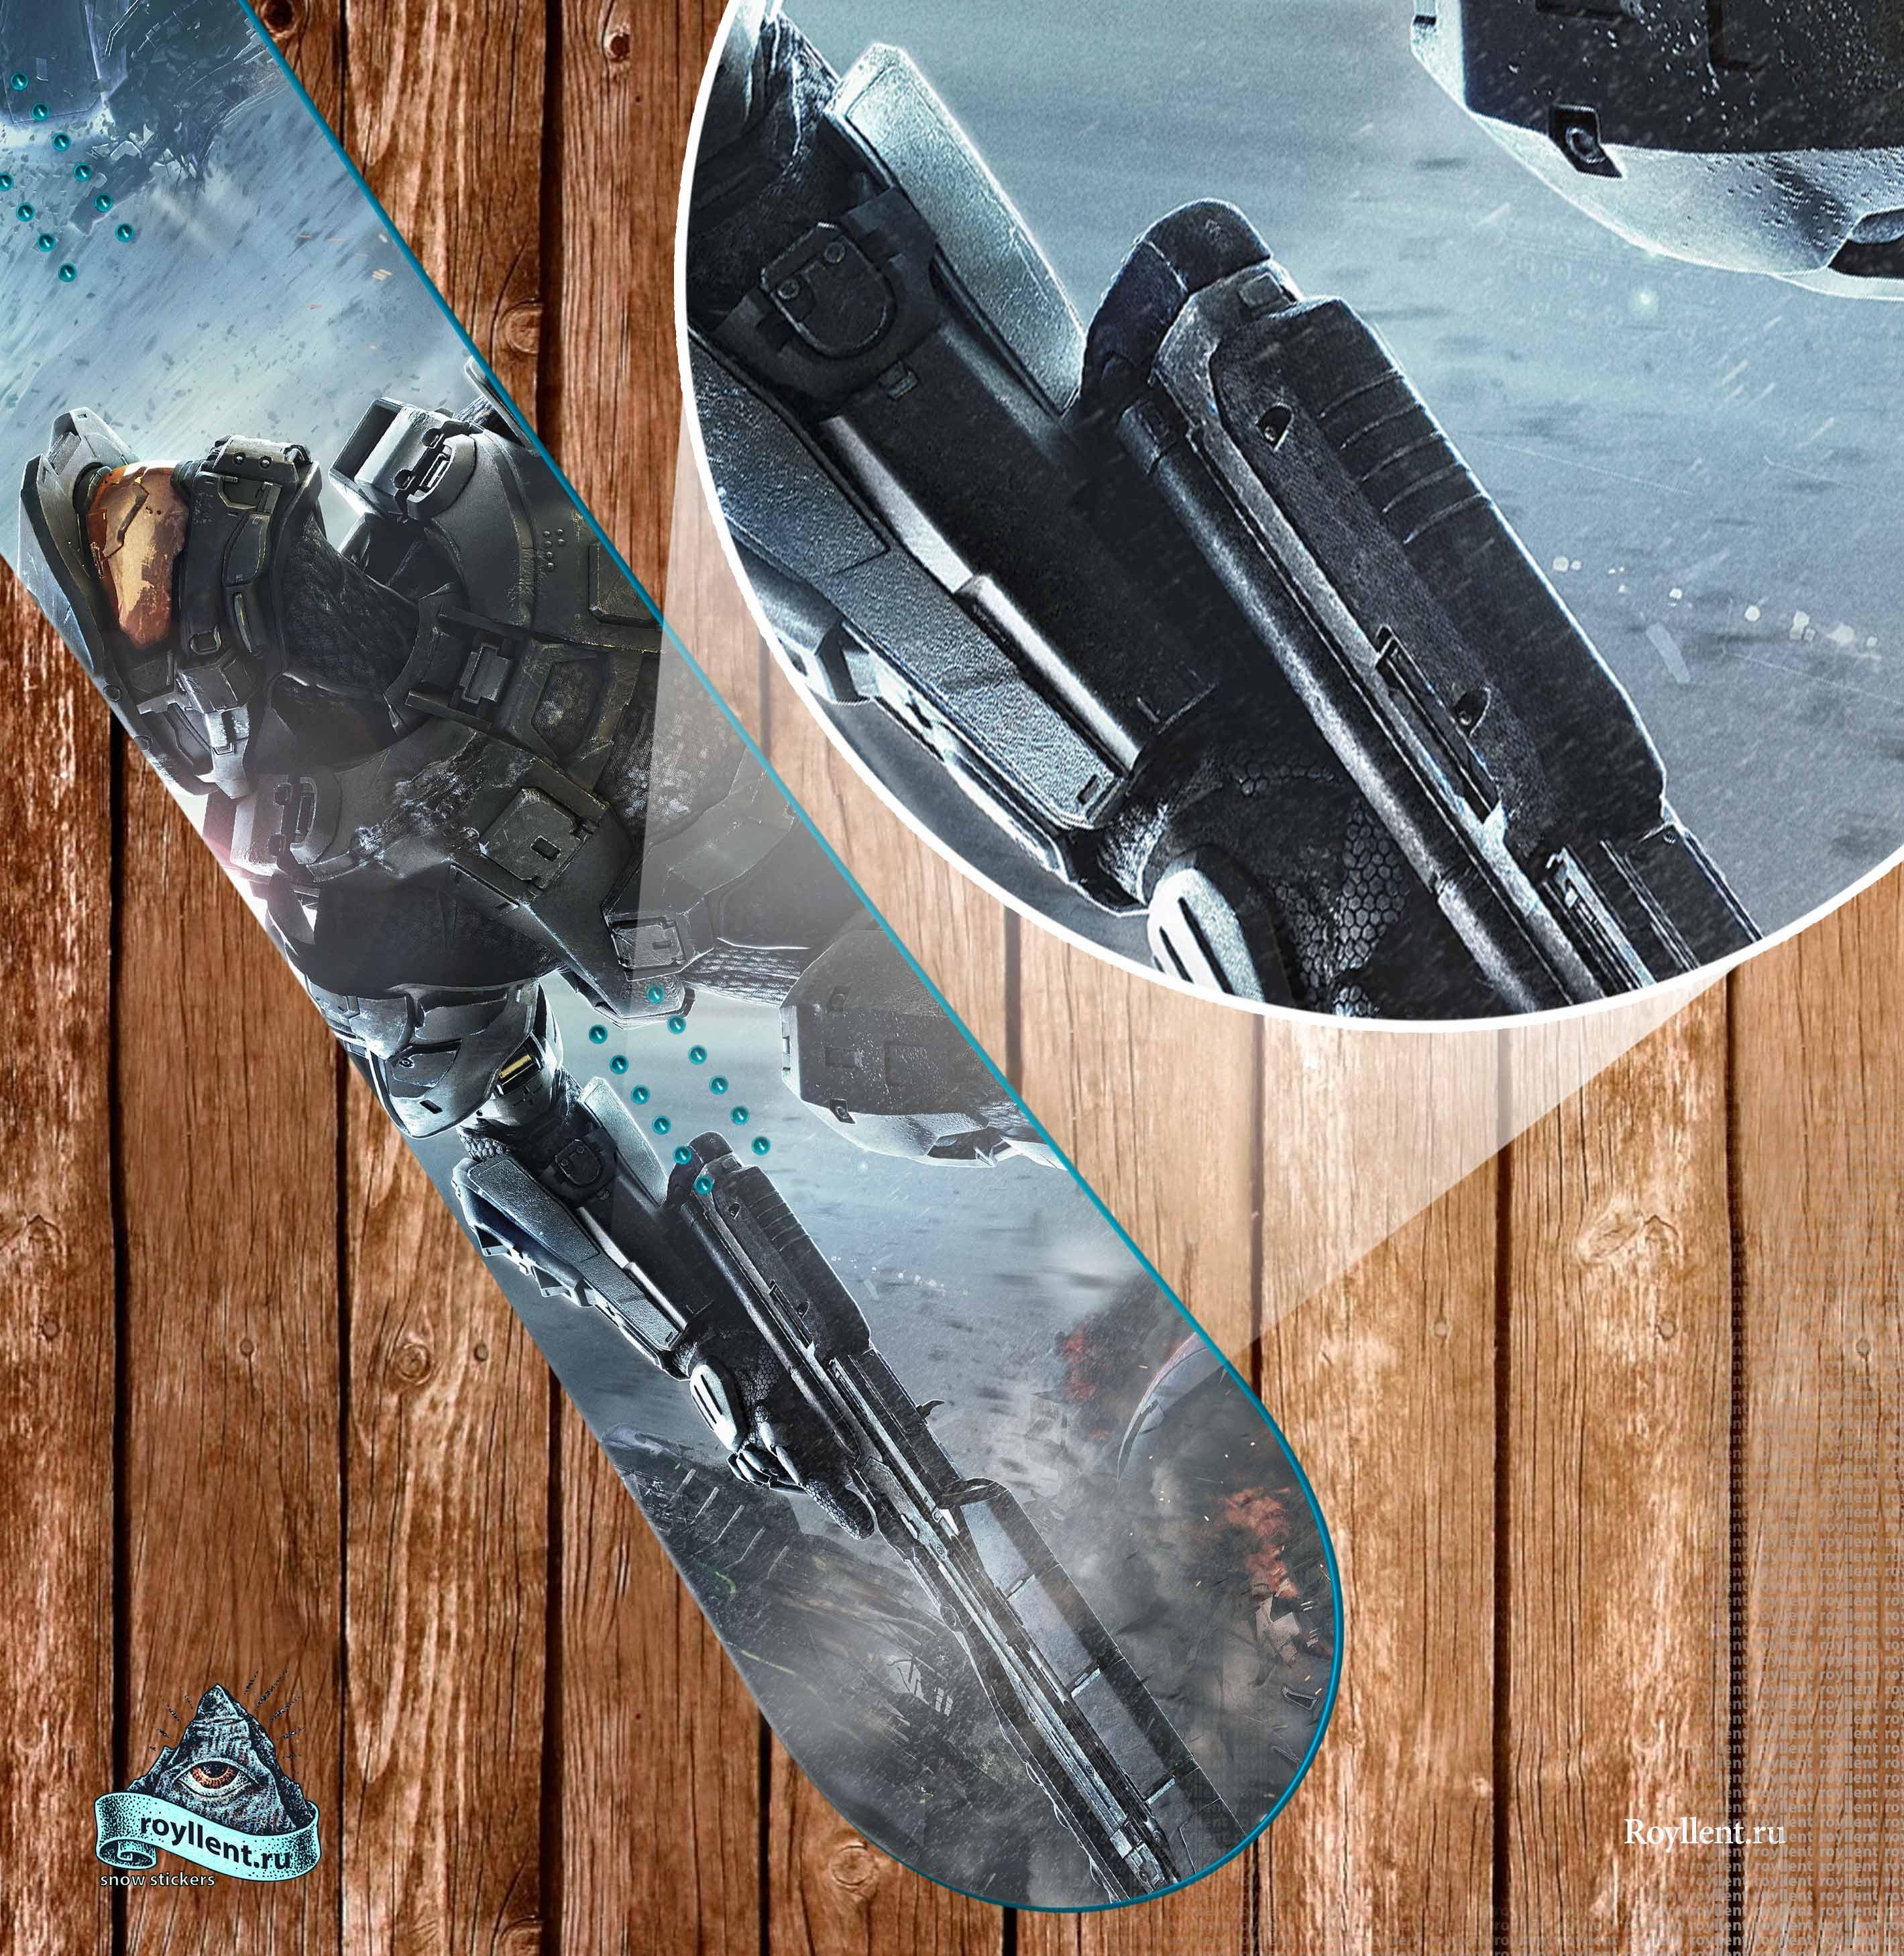 Сноуборд наклейка на доску виниловая HALO